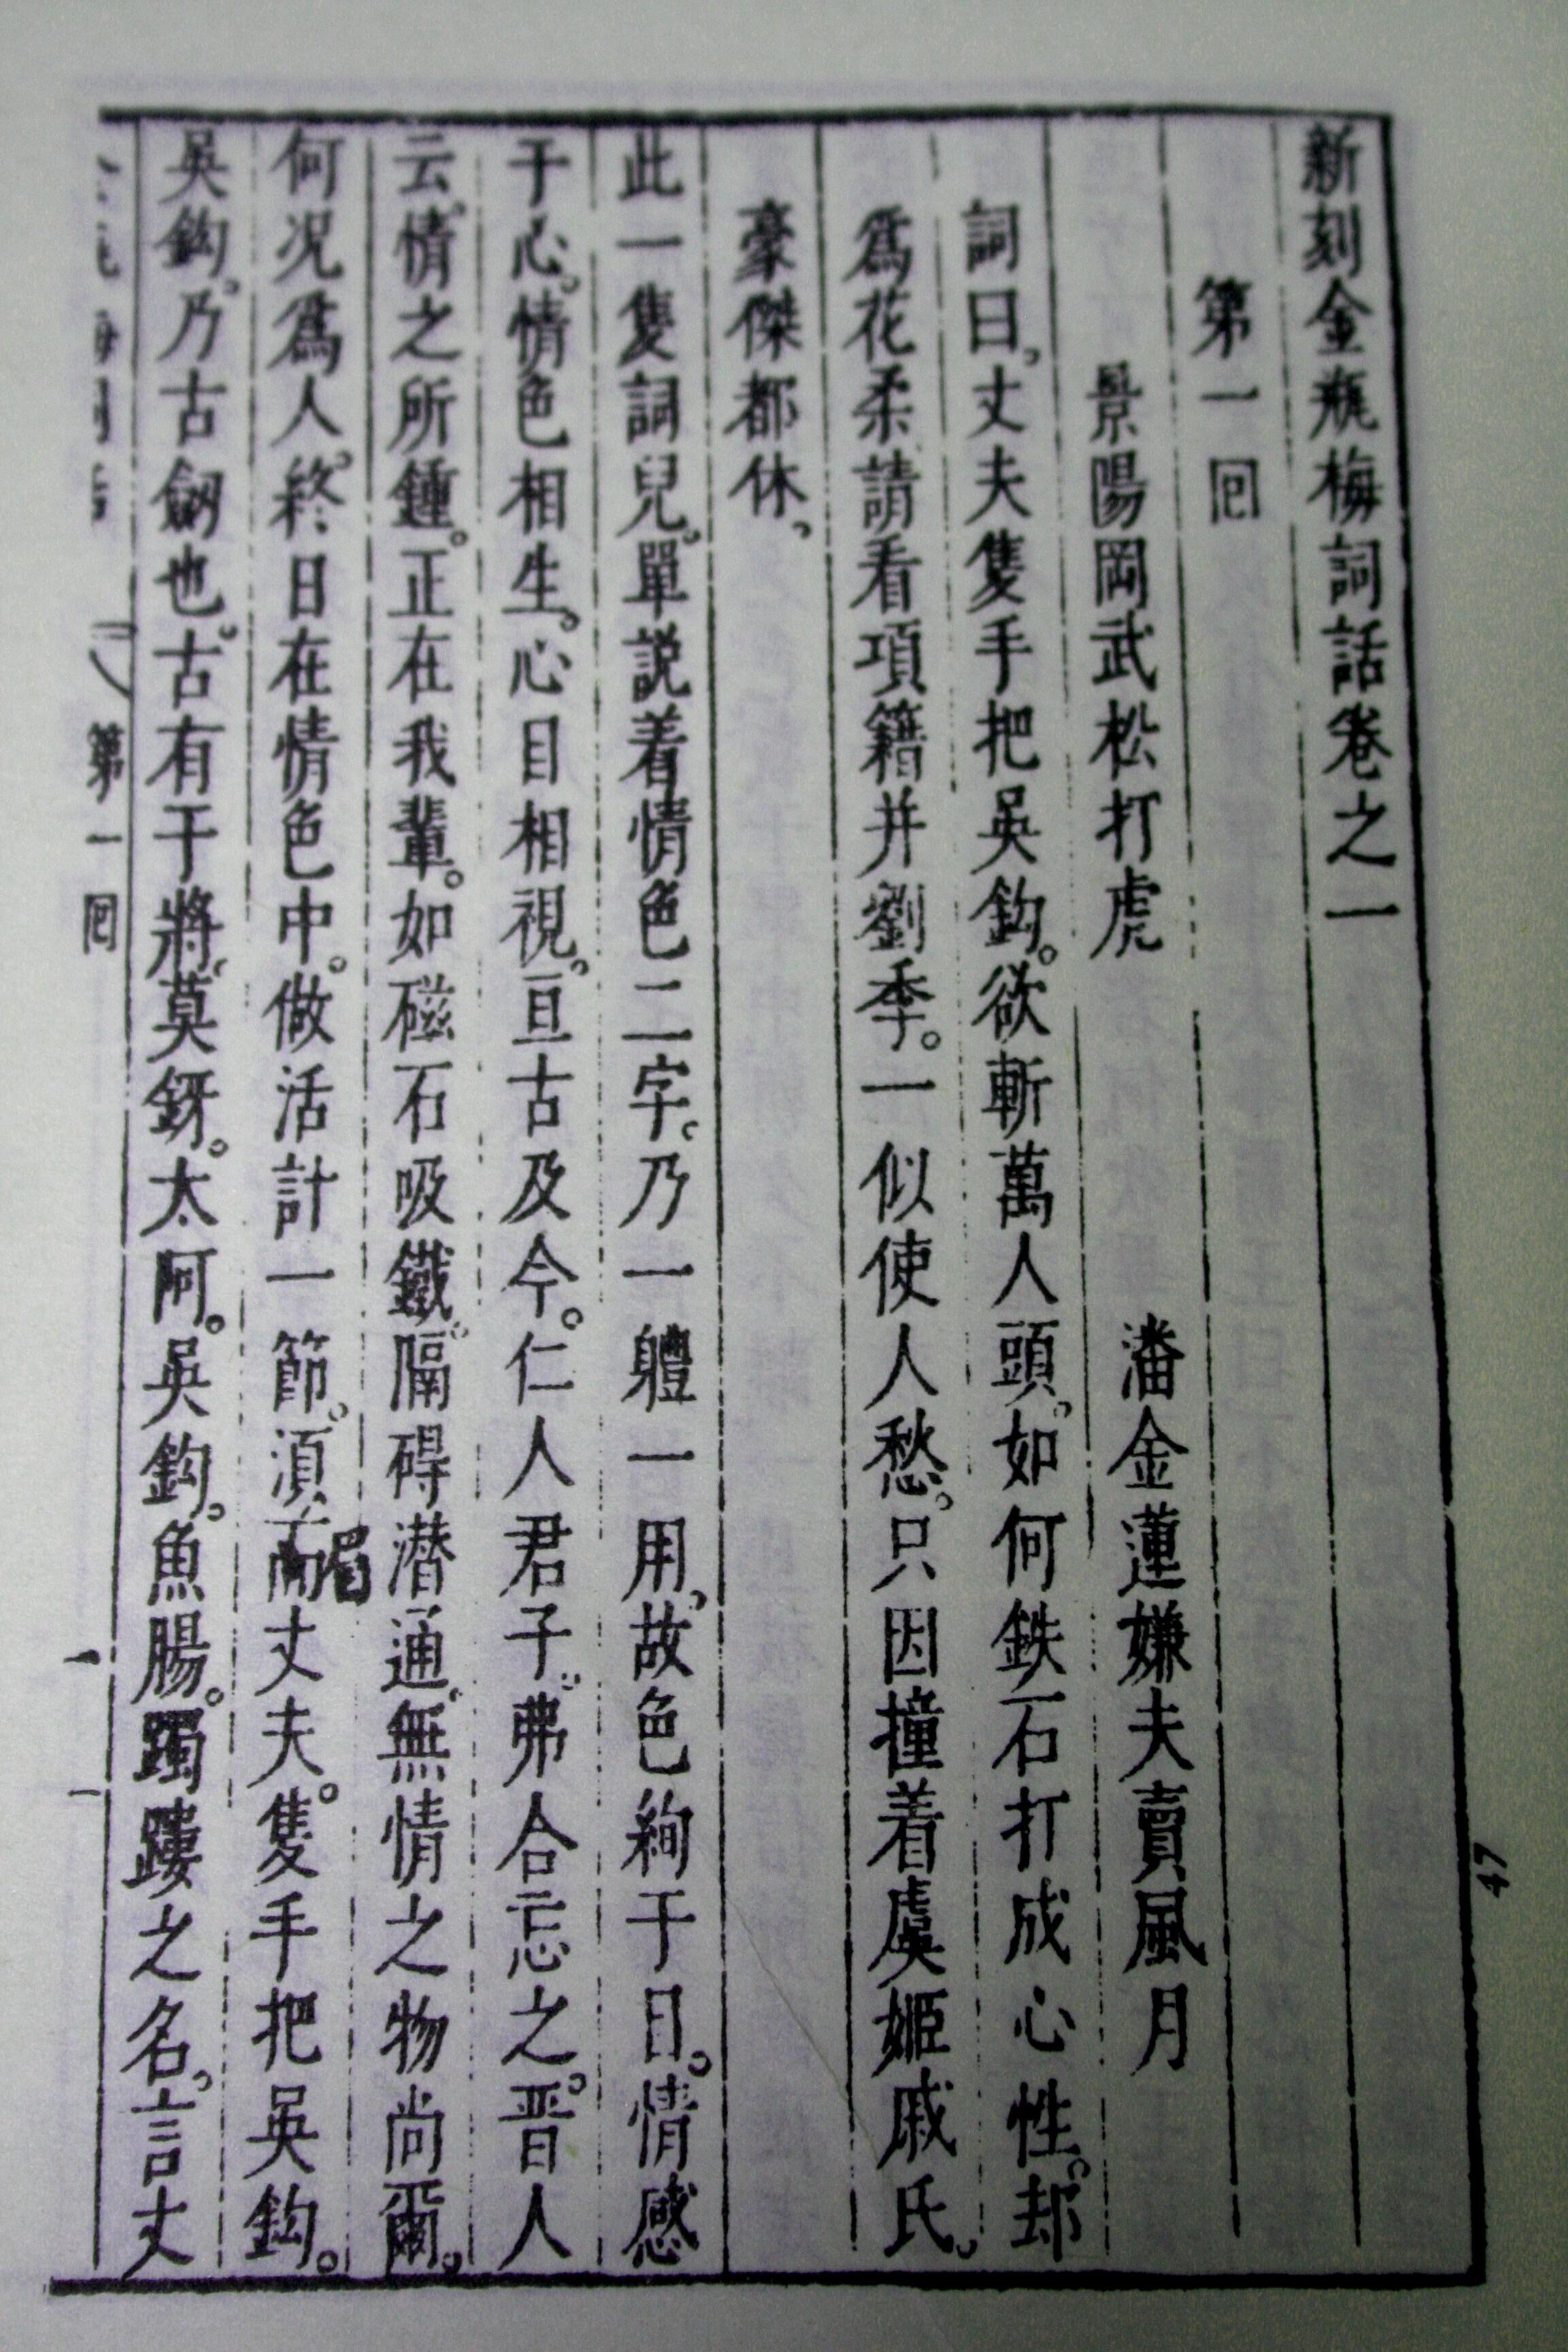 Jin Ping Mei - Wikipedia